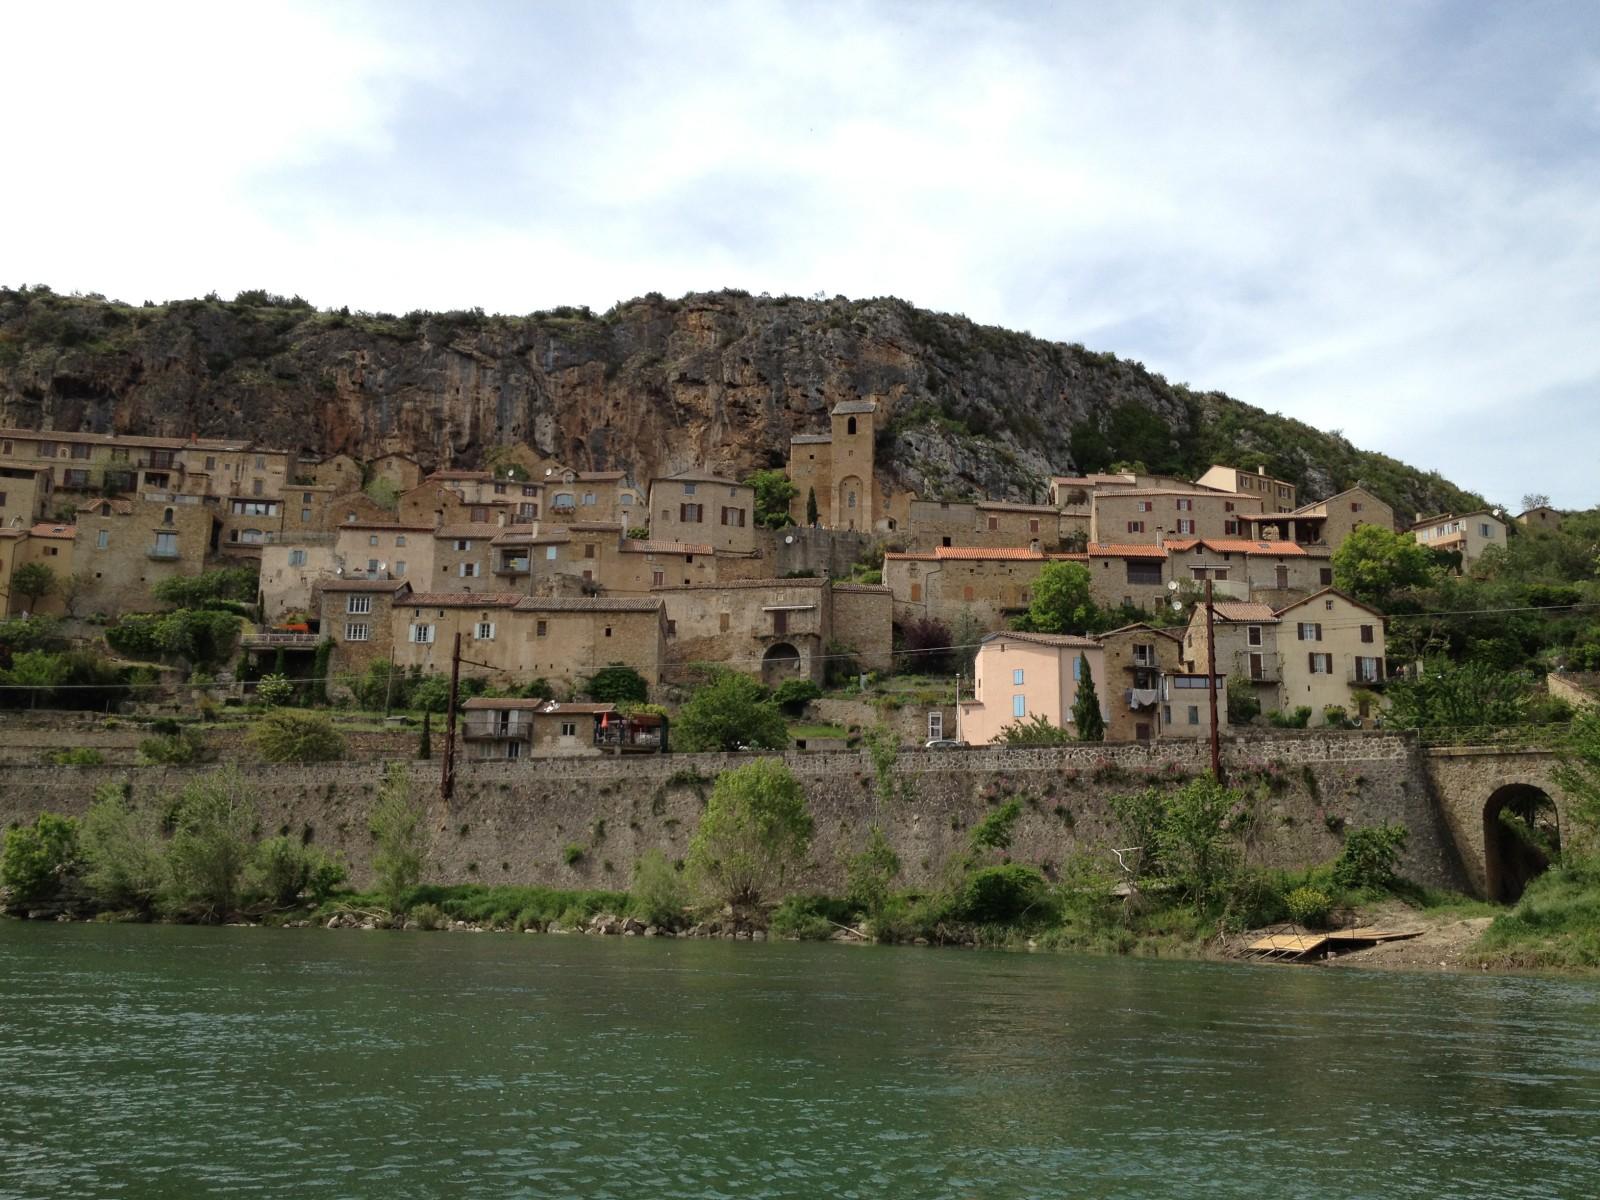 Aldeia de Peyre - Bateliers su Viaduc - Millau - Aveyron © Viaje Comigo